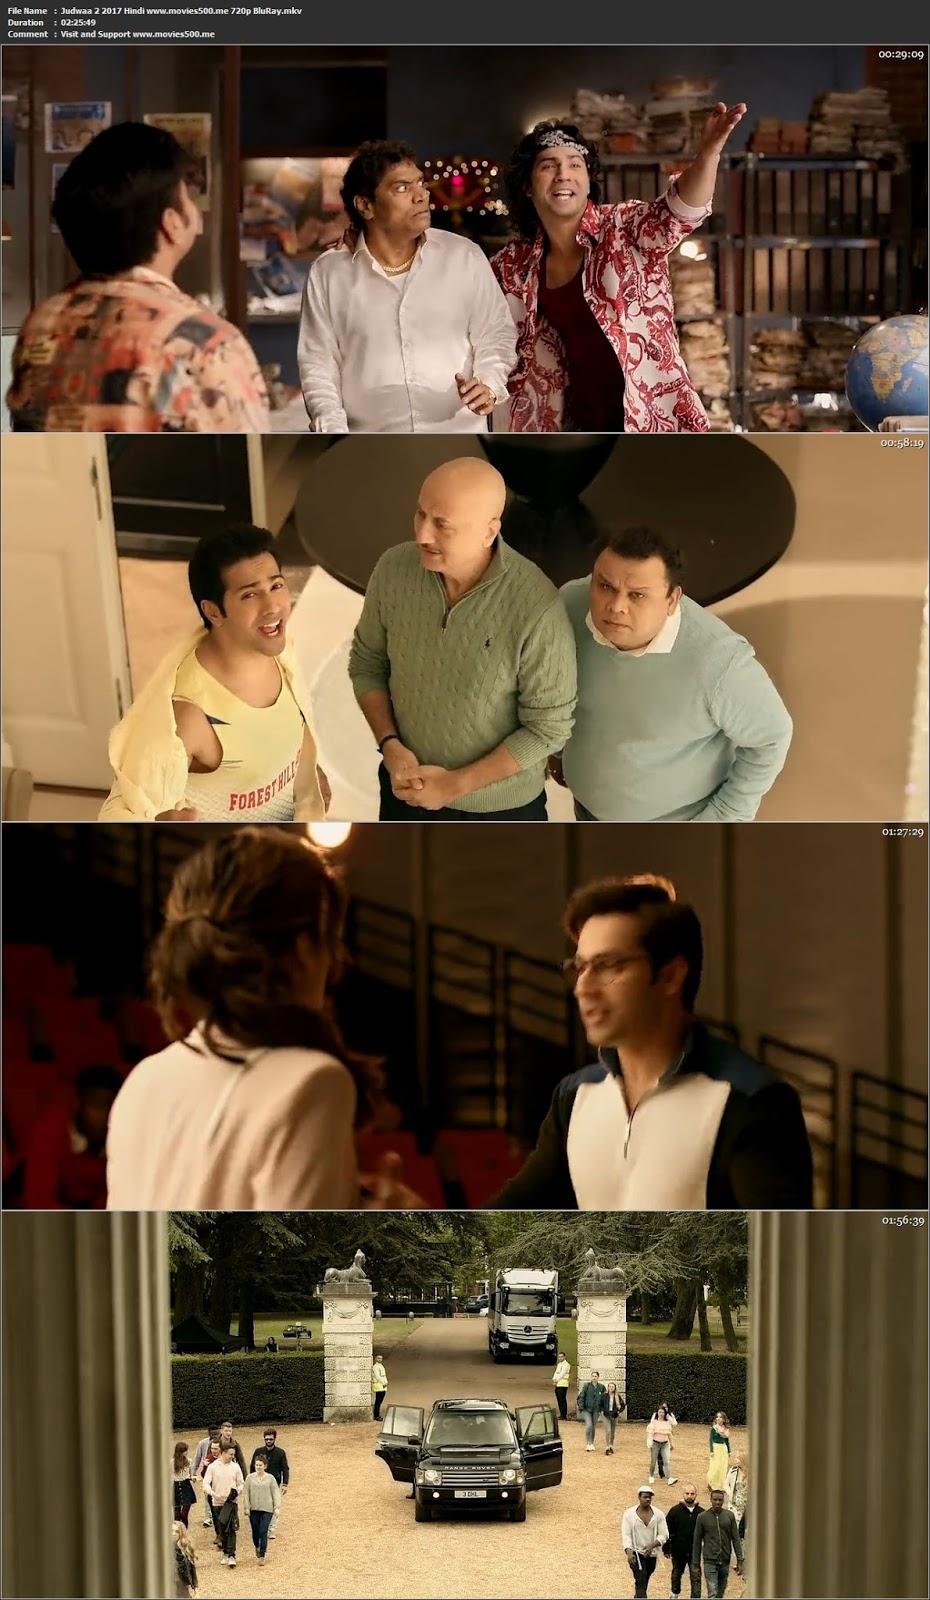 Judwaa 2 2017 Hindi Full Movie BluRay 720p 1GB at scientologymag.com